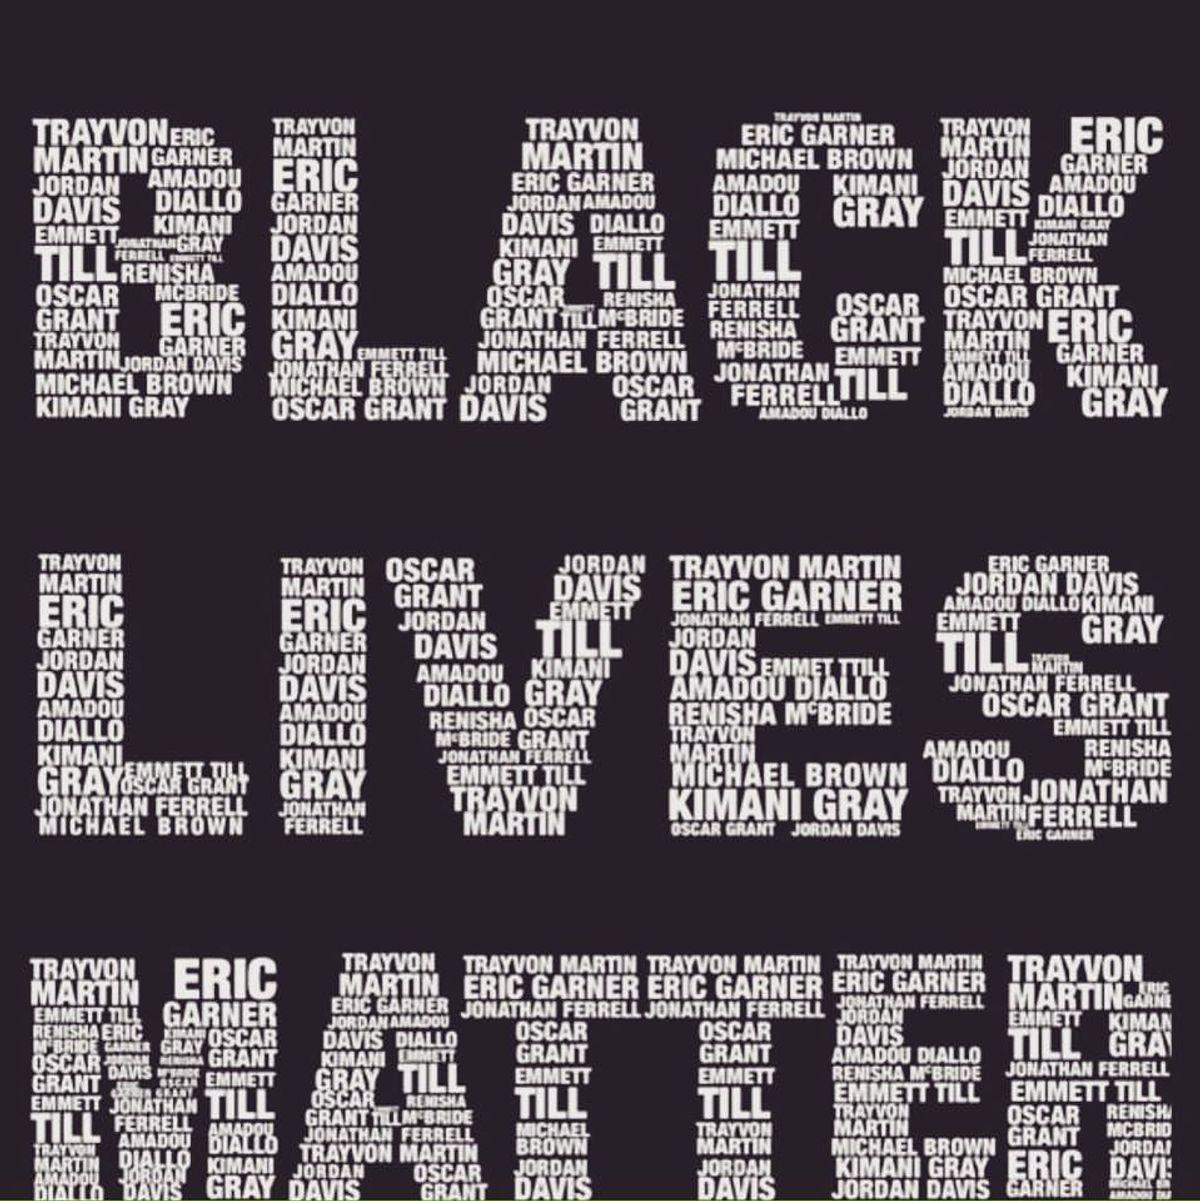 #BlackLivesMatter And #StandWithDallas